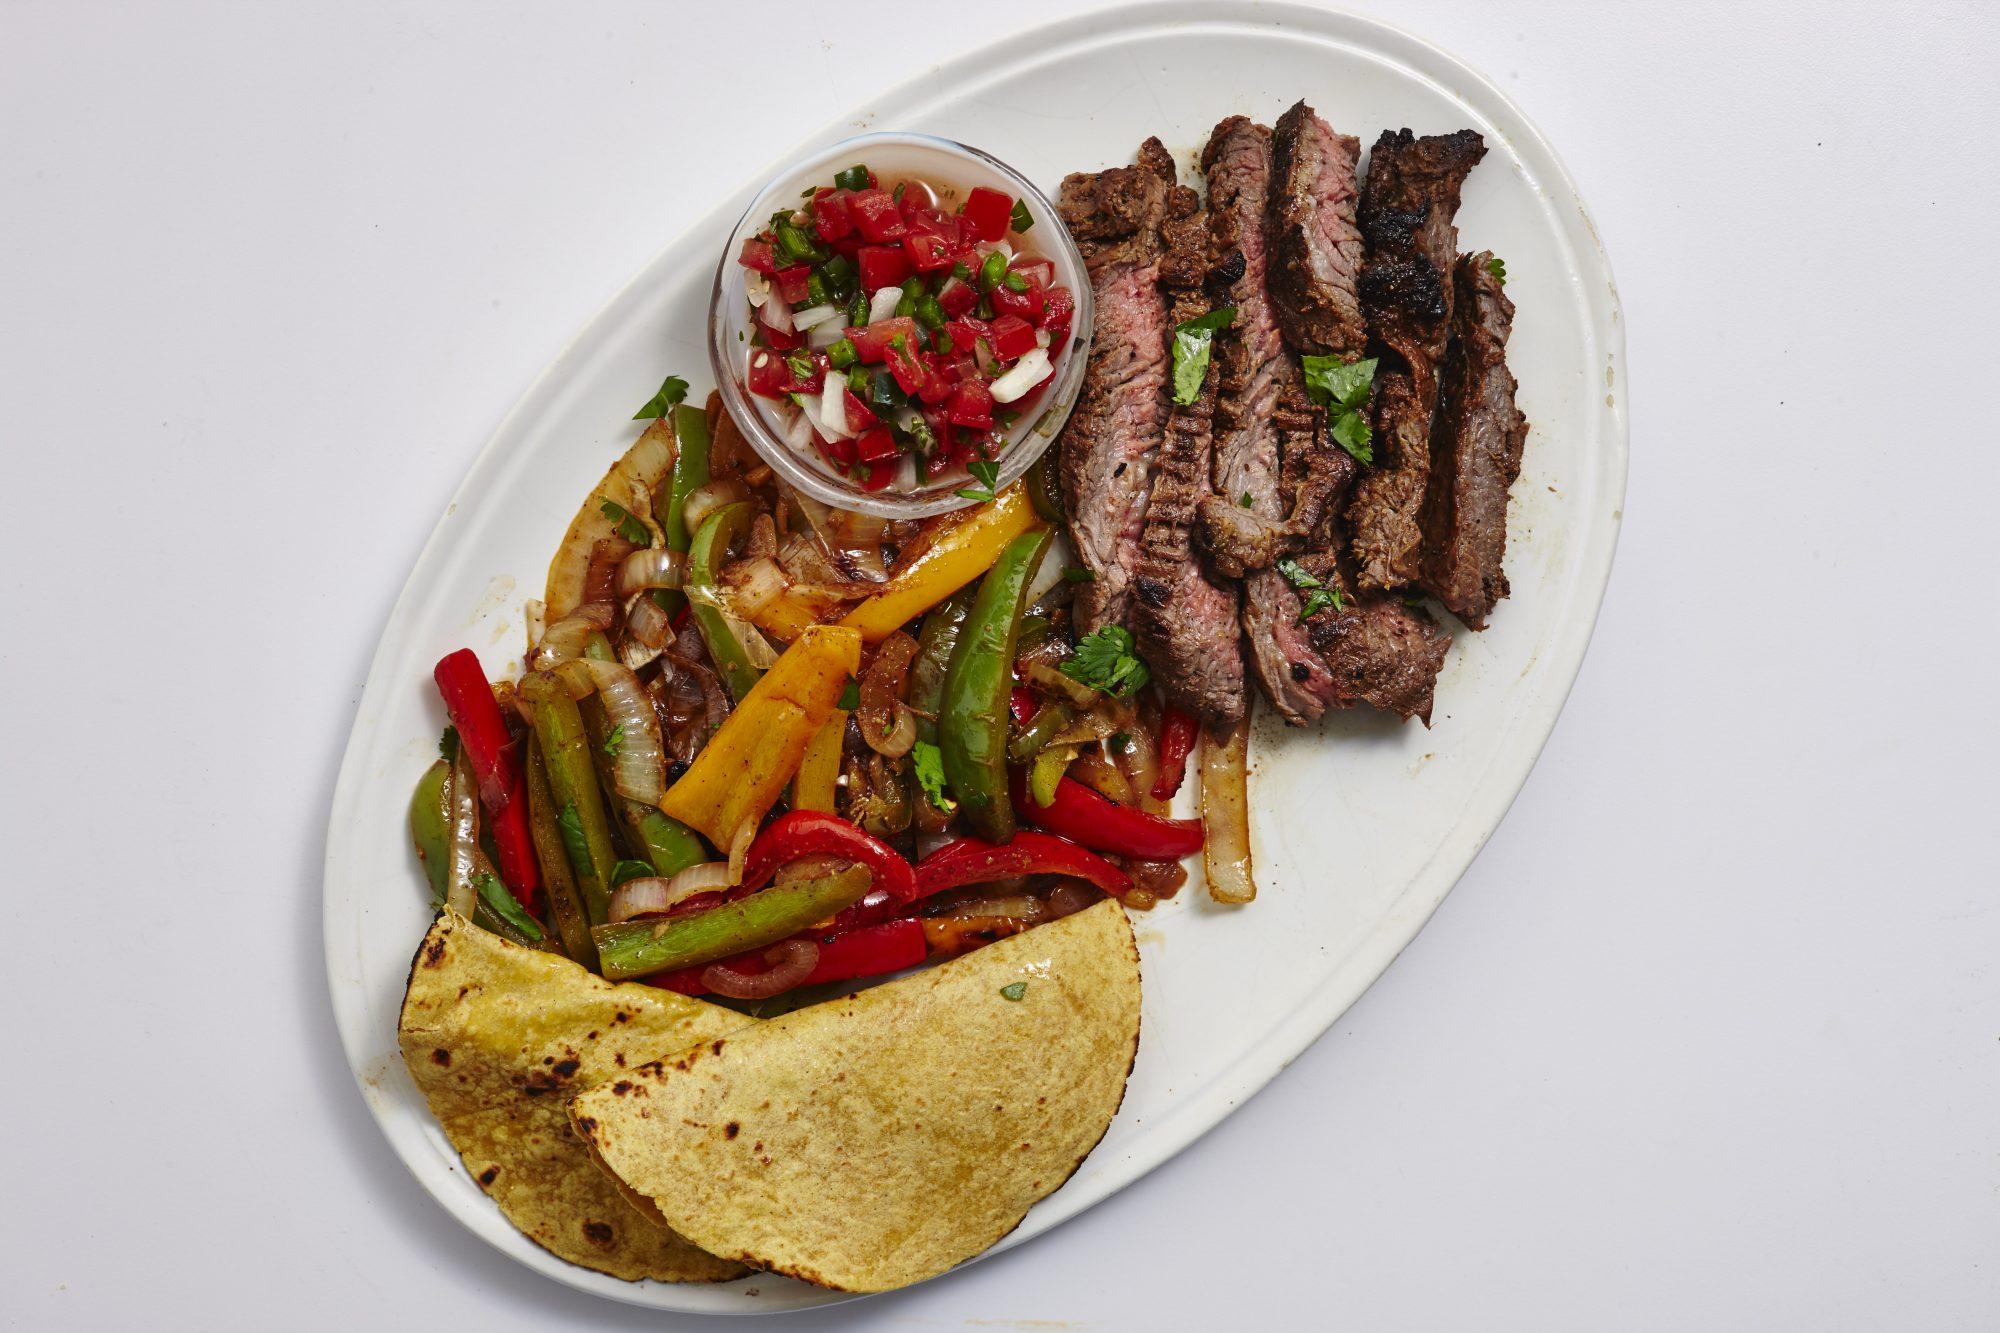 Best Steak Fajitas image